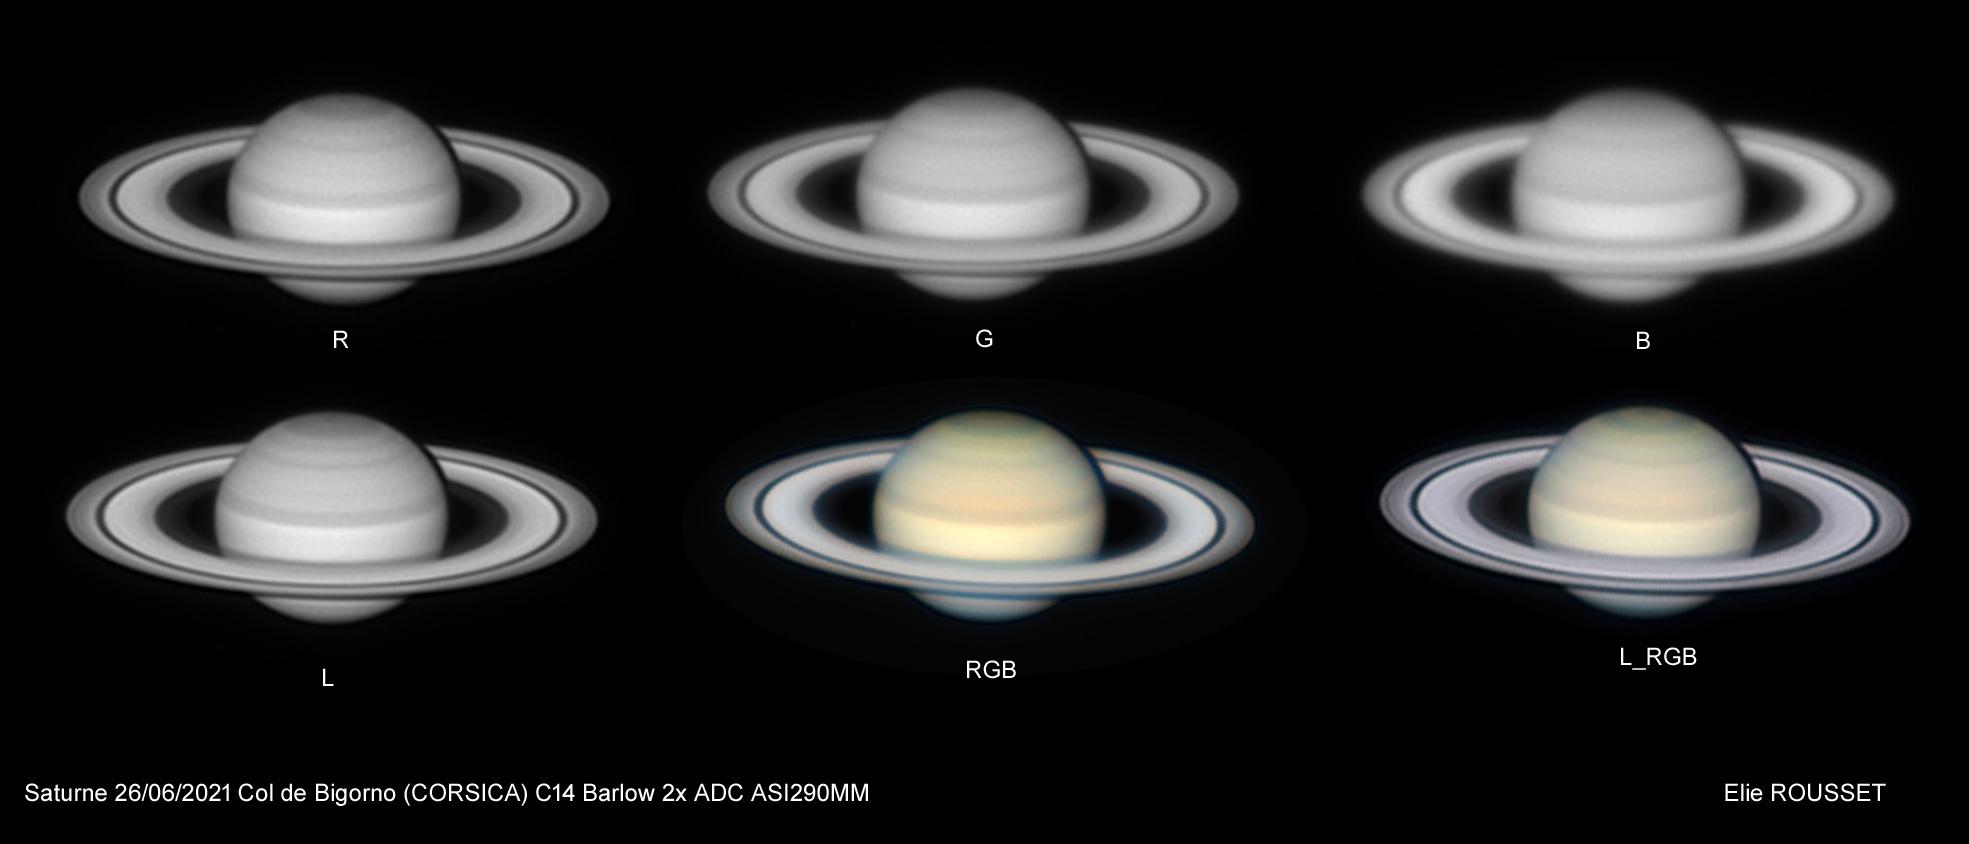 large.Saturne-26-06-2021-Planche1.jpg.cc3fa7fcfe9d6e381f1c39b5b2c28b45.jpg